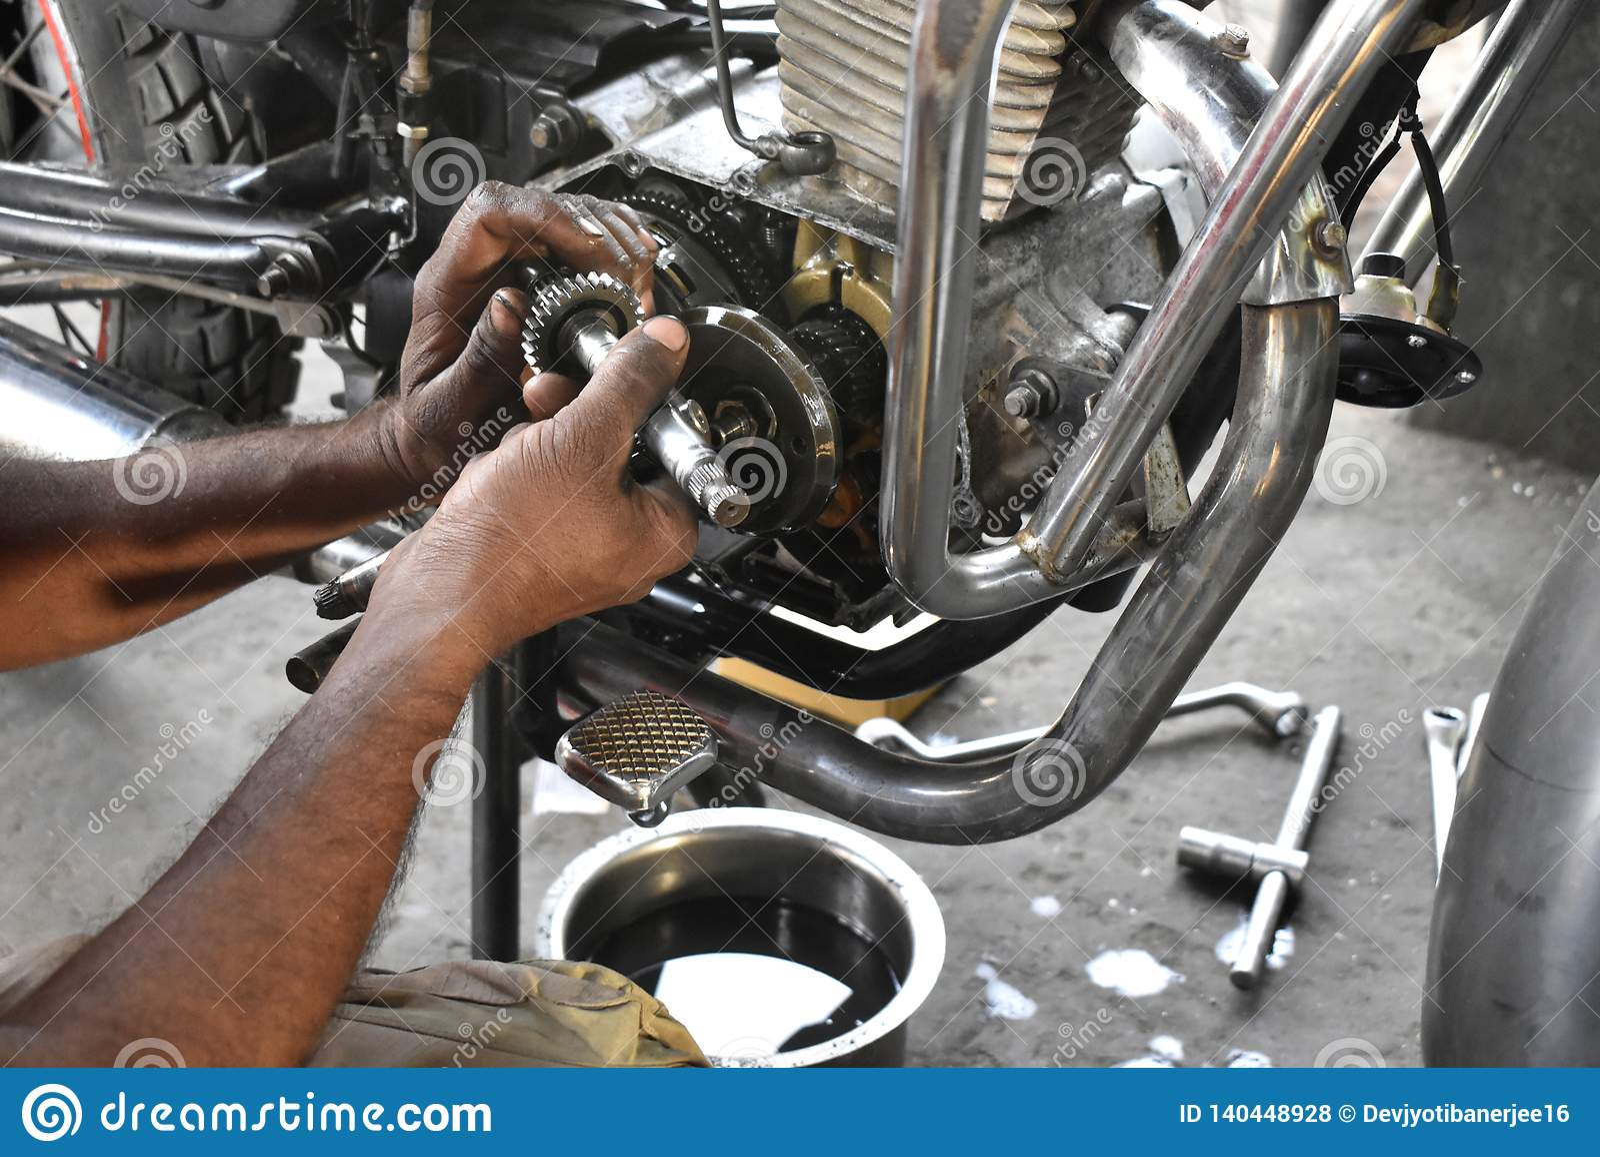 A mechanic repairing motor bike,maintenance, technical